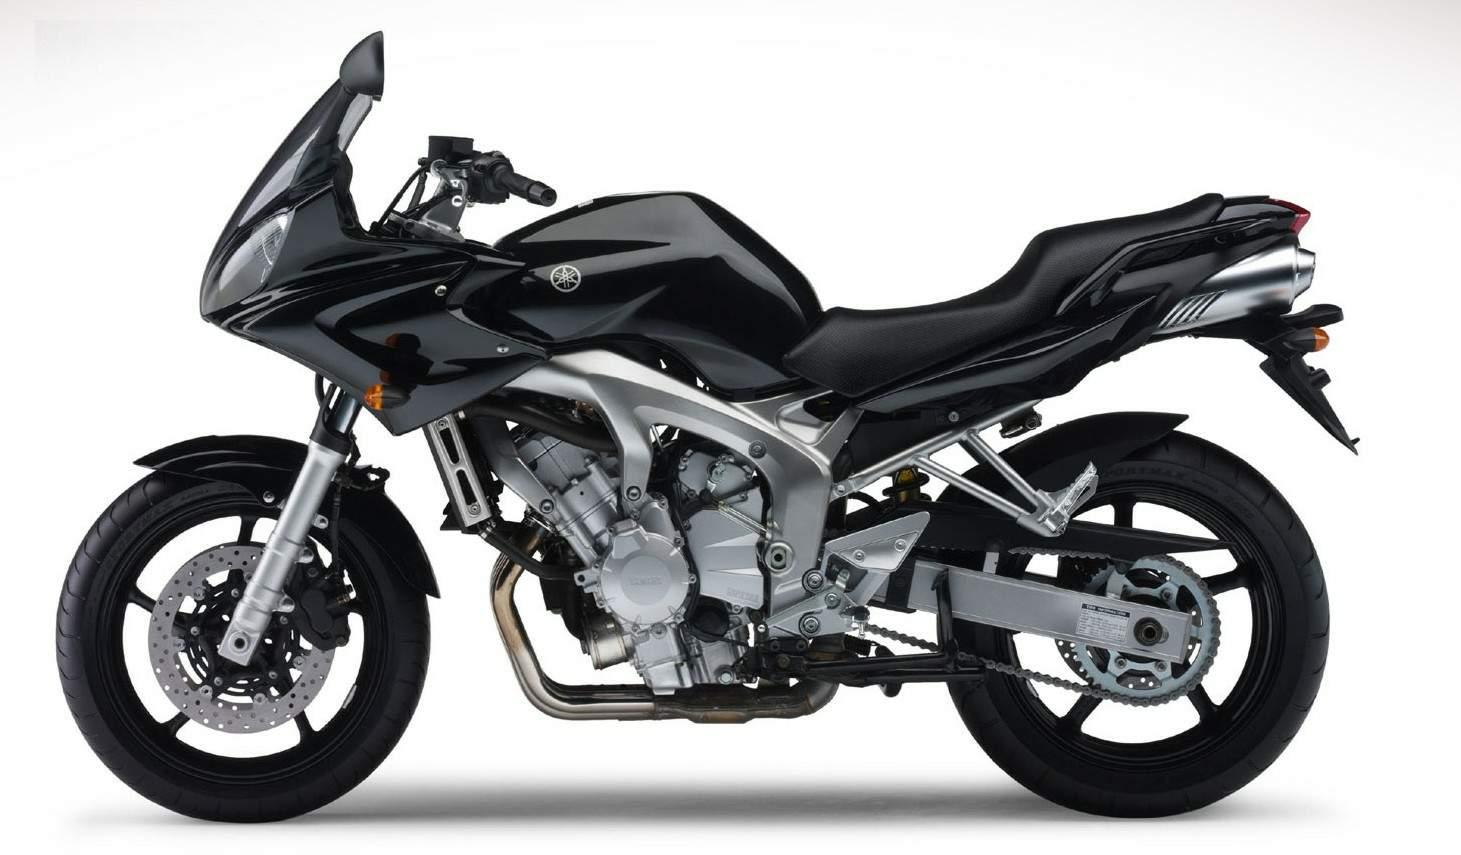 2007 Yamaha FZ 6N S2 ABS Wallpaper - Mbike.com